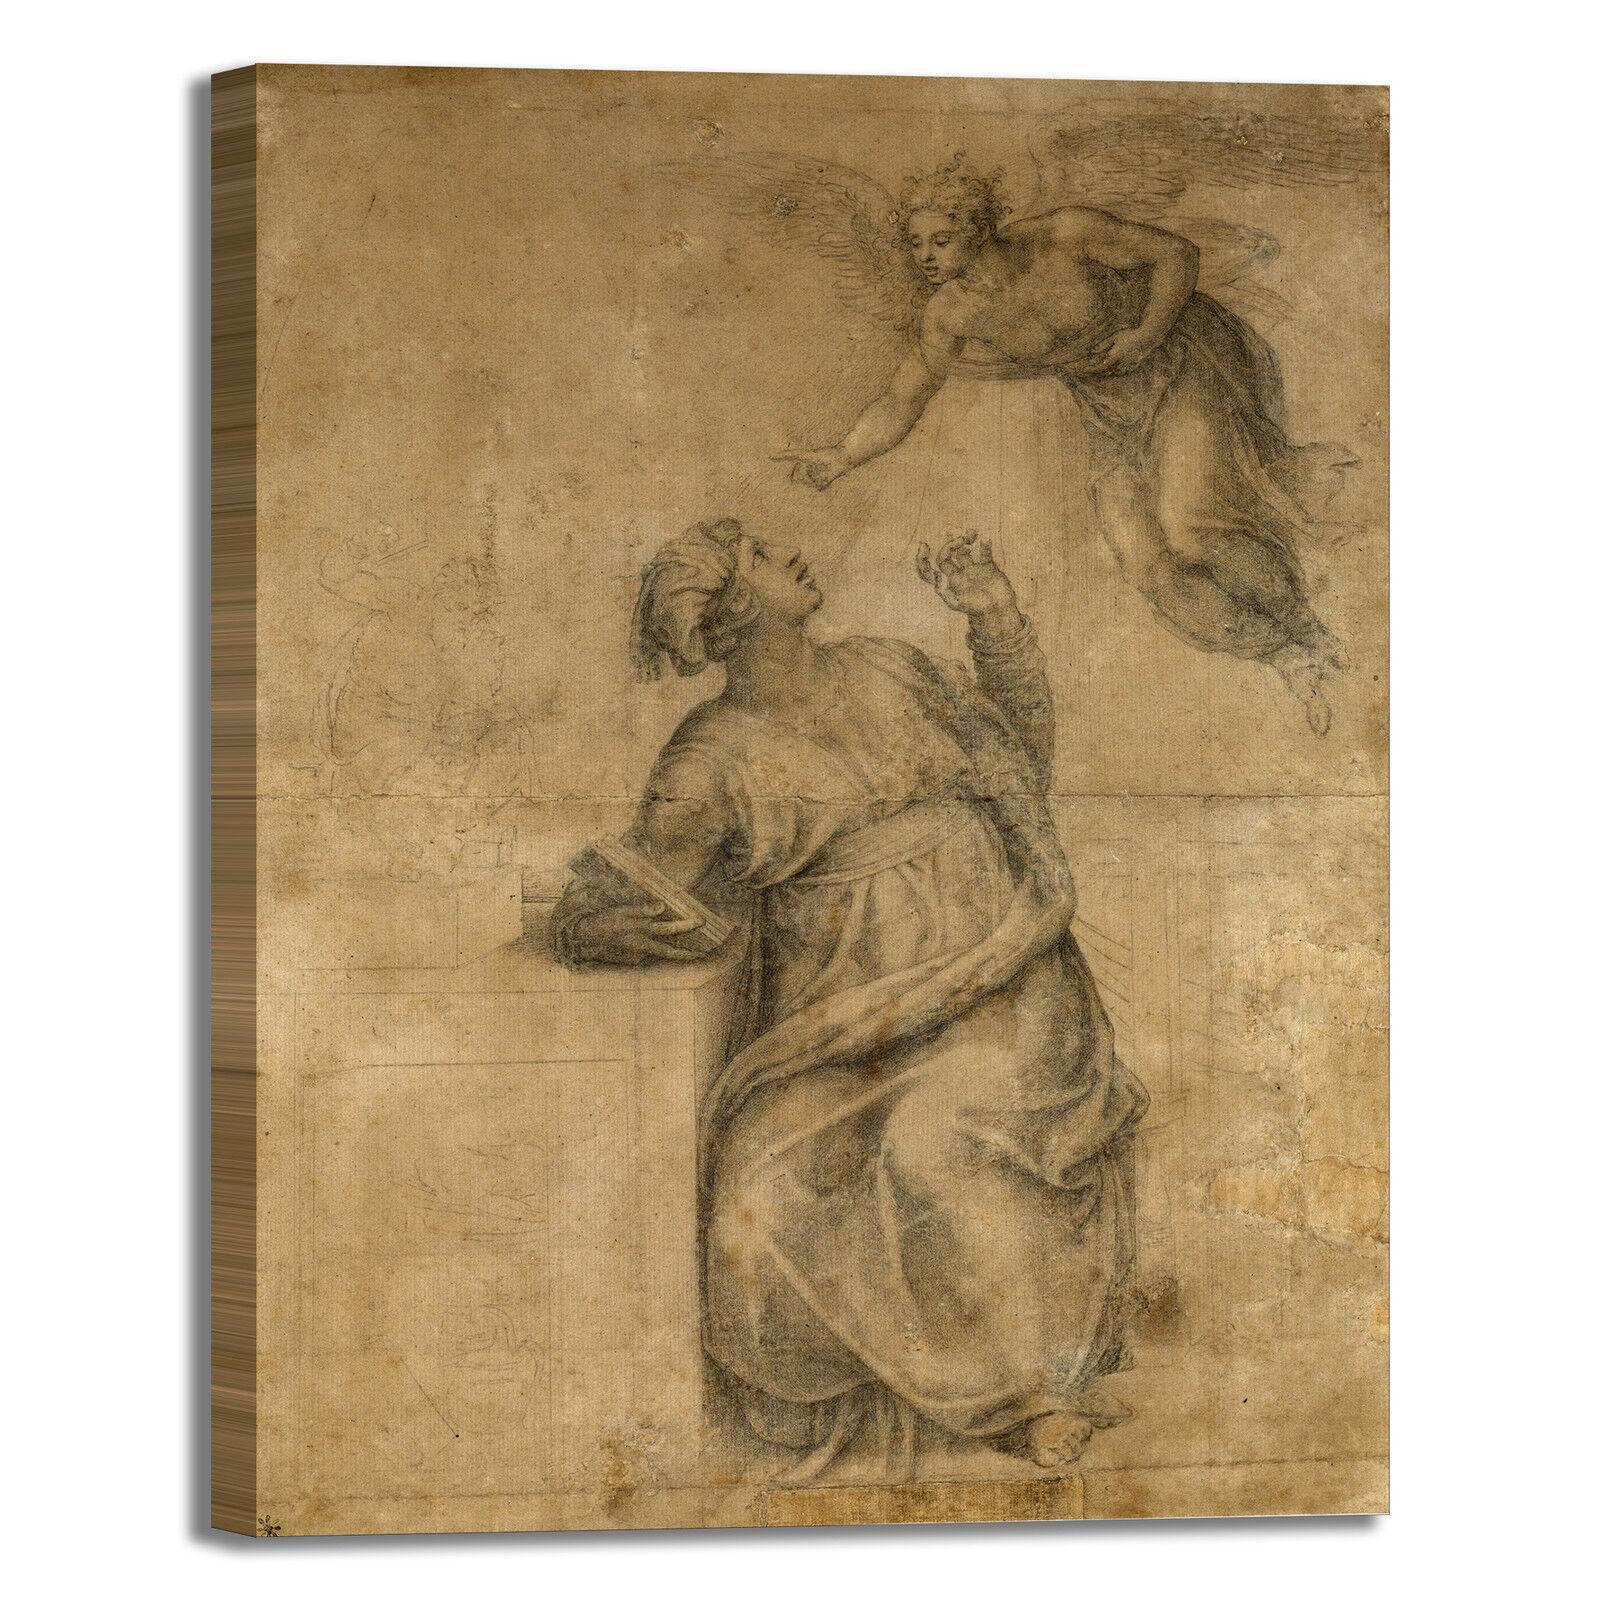 Michelangelo annunciazione stampa Vergine quadro stampa annunciazione tela dipinto telaio arRouge o casa dbd0ea